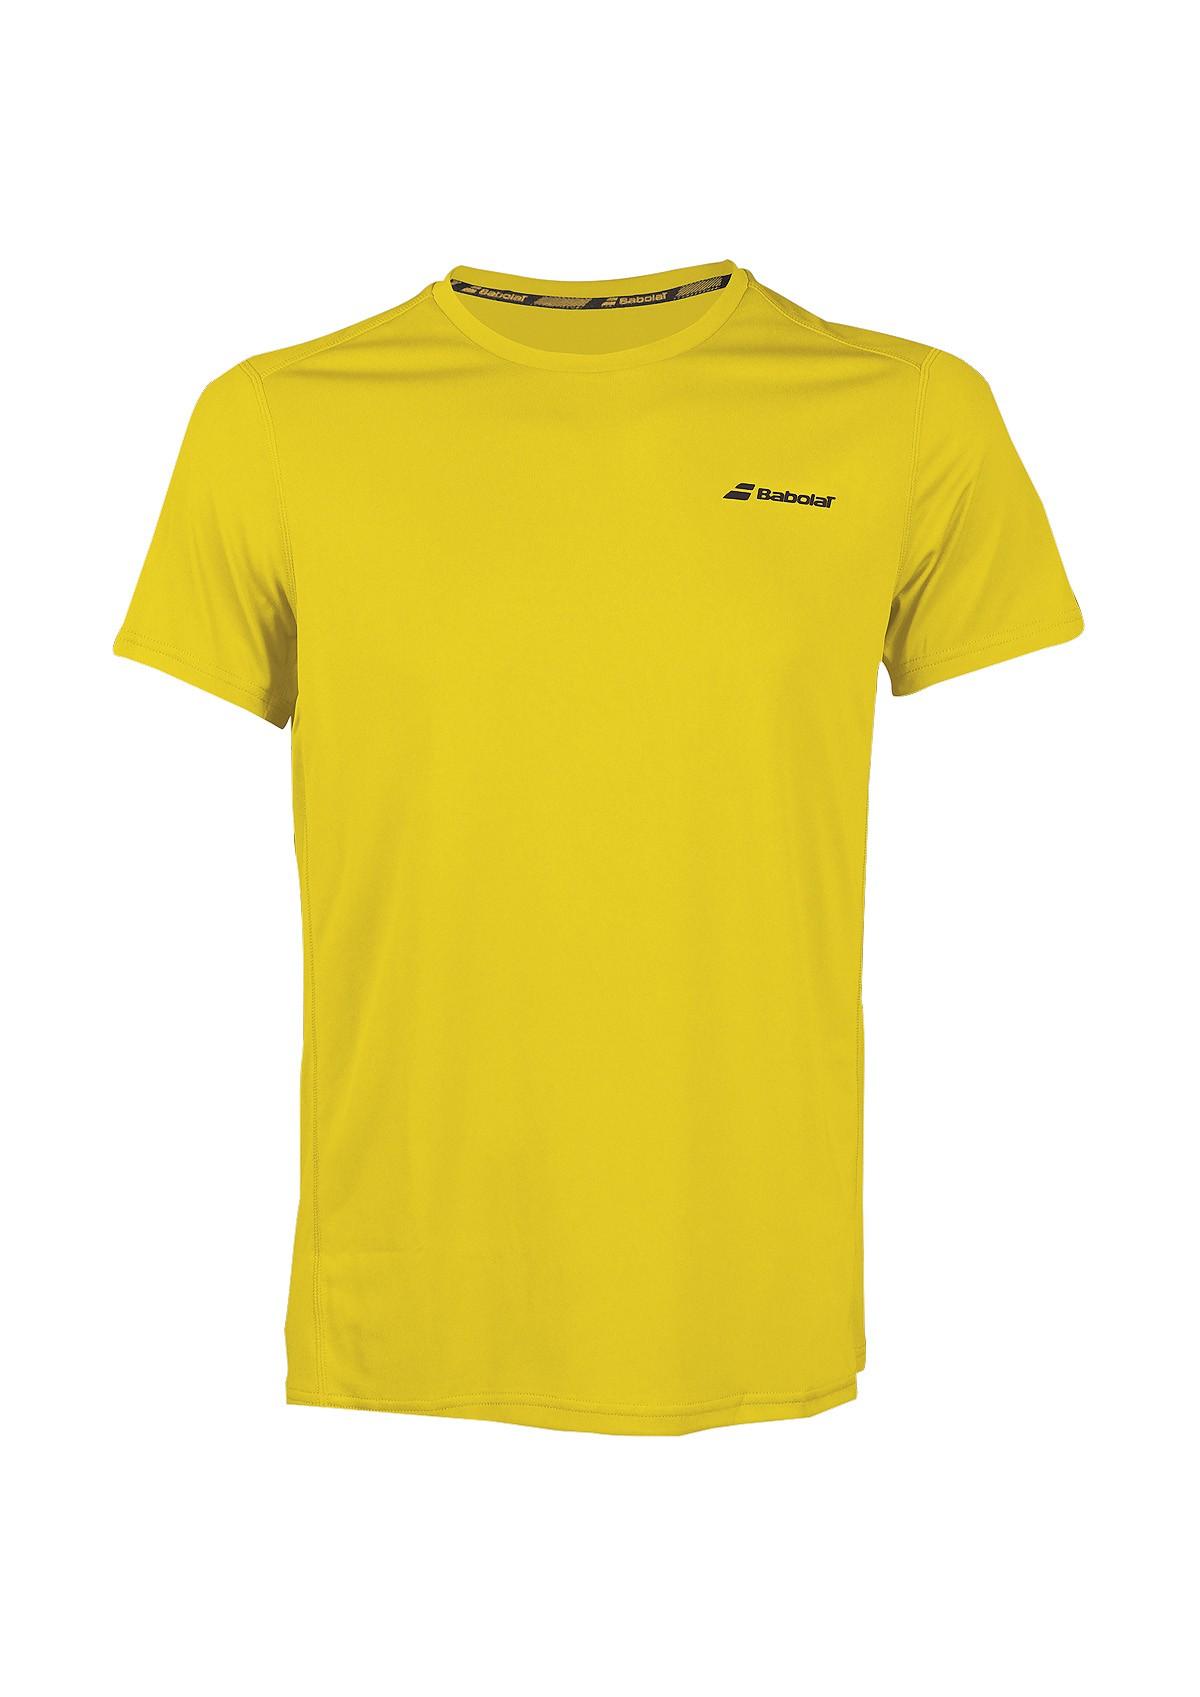 Koszulka tenisowa Babolat CORE T-shirt Yellow -45%